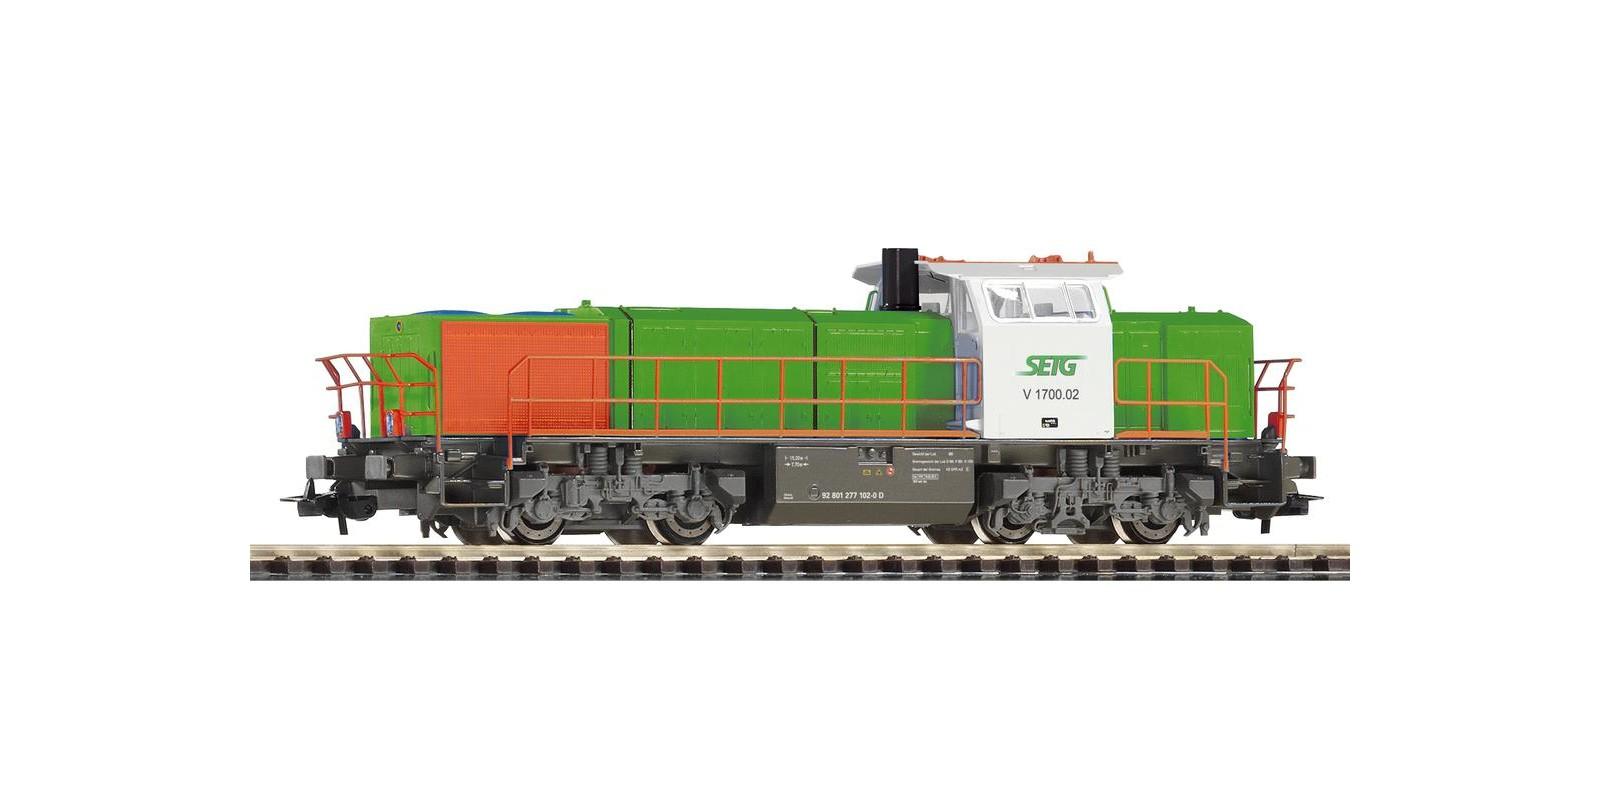 PI59219 ~V1700.02 Diesel SETG VI